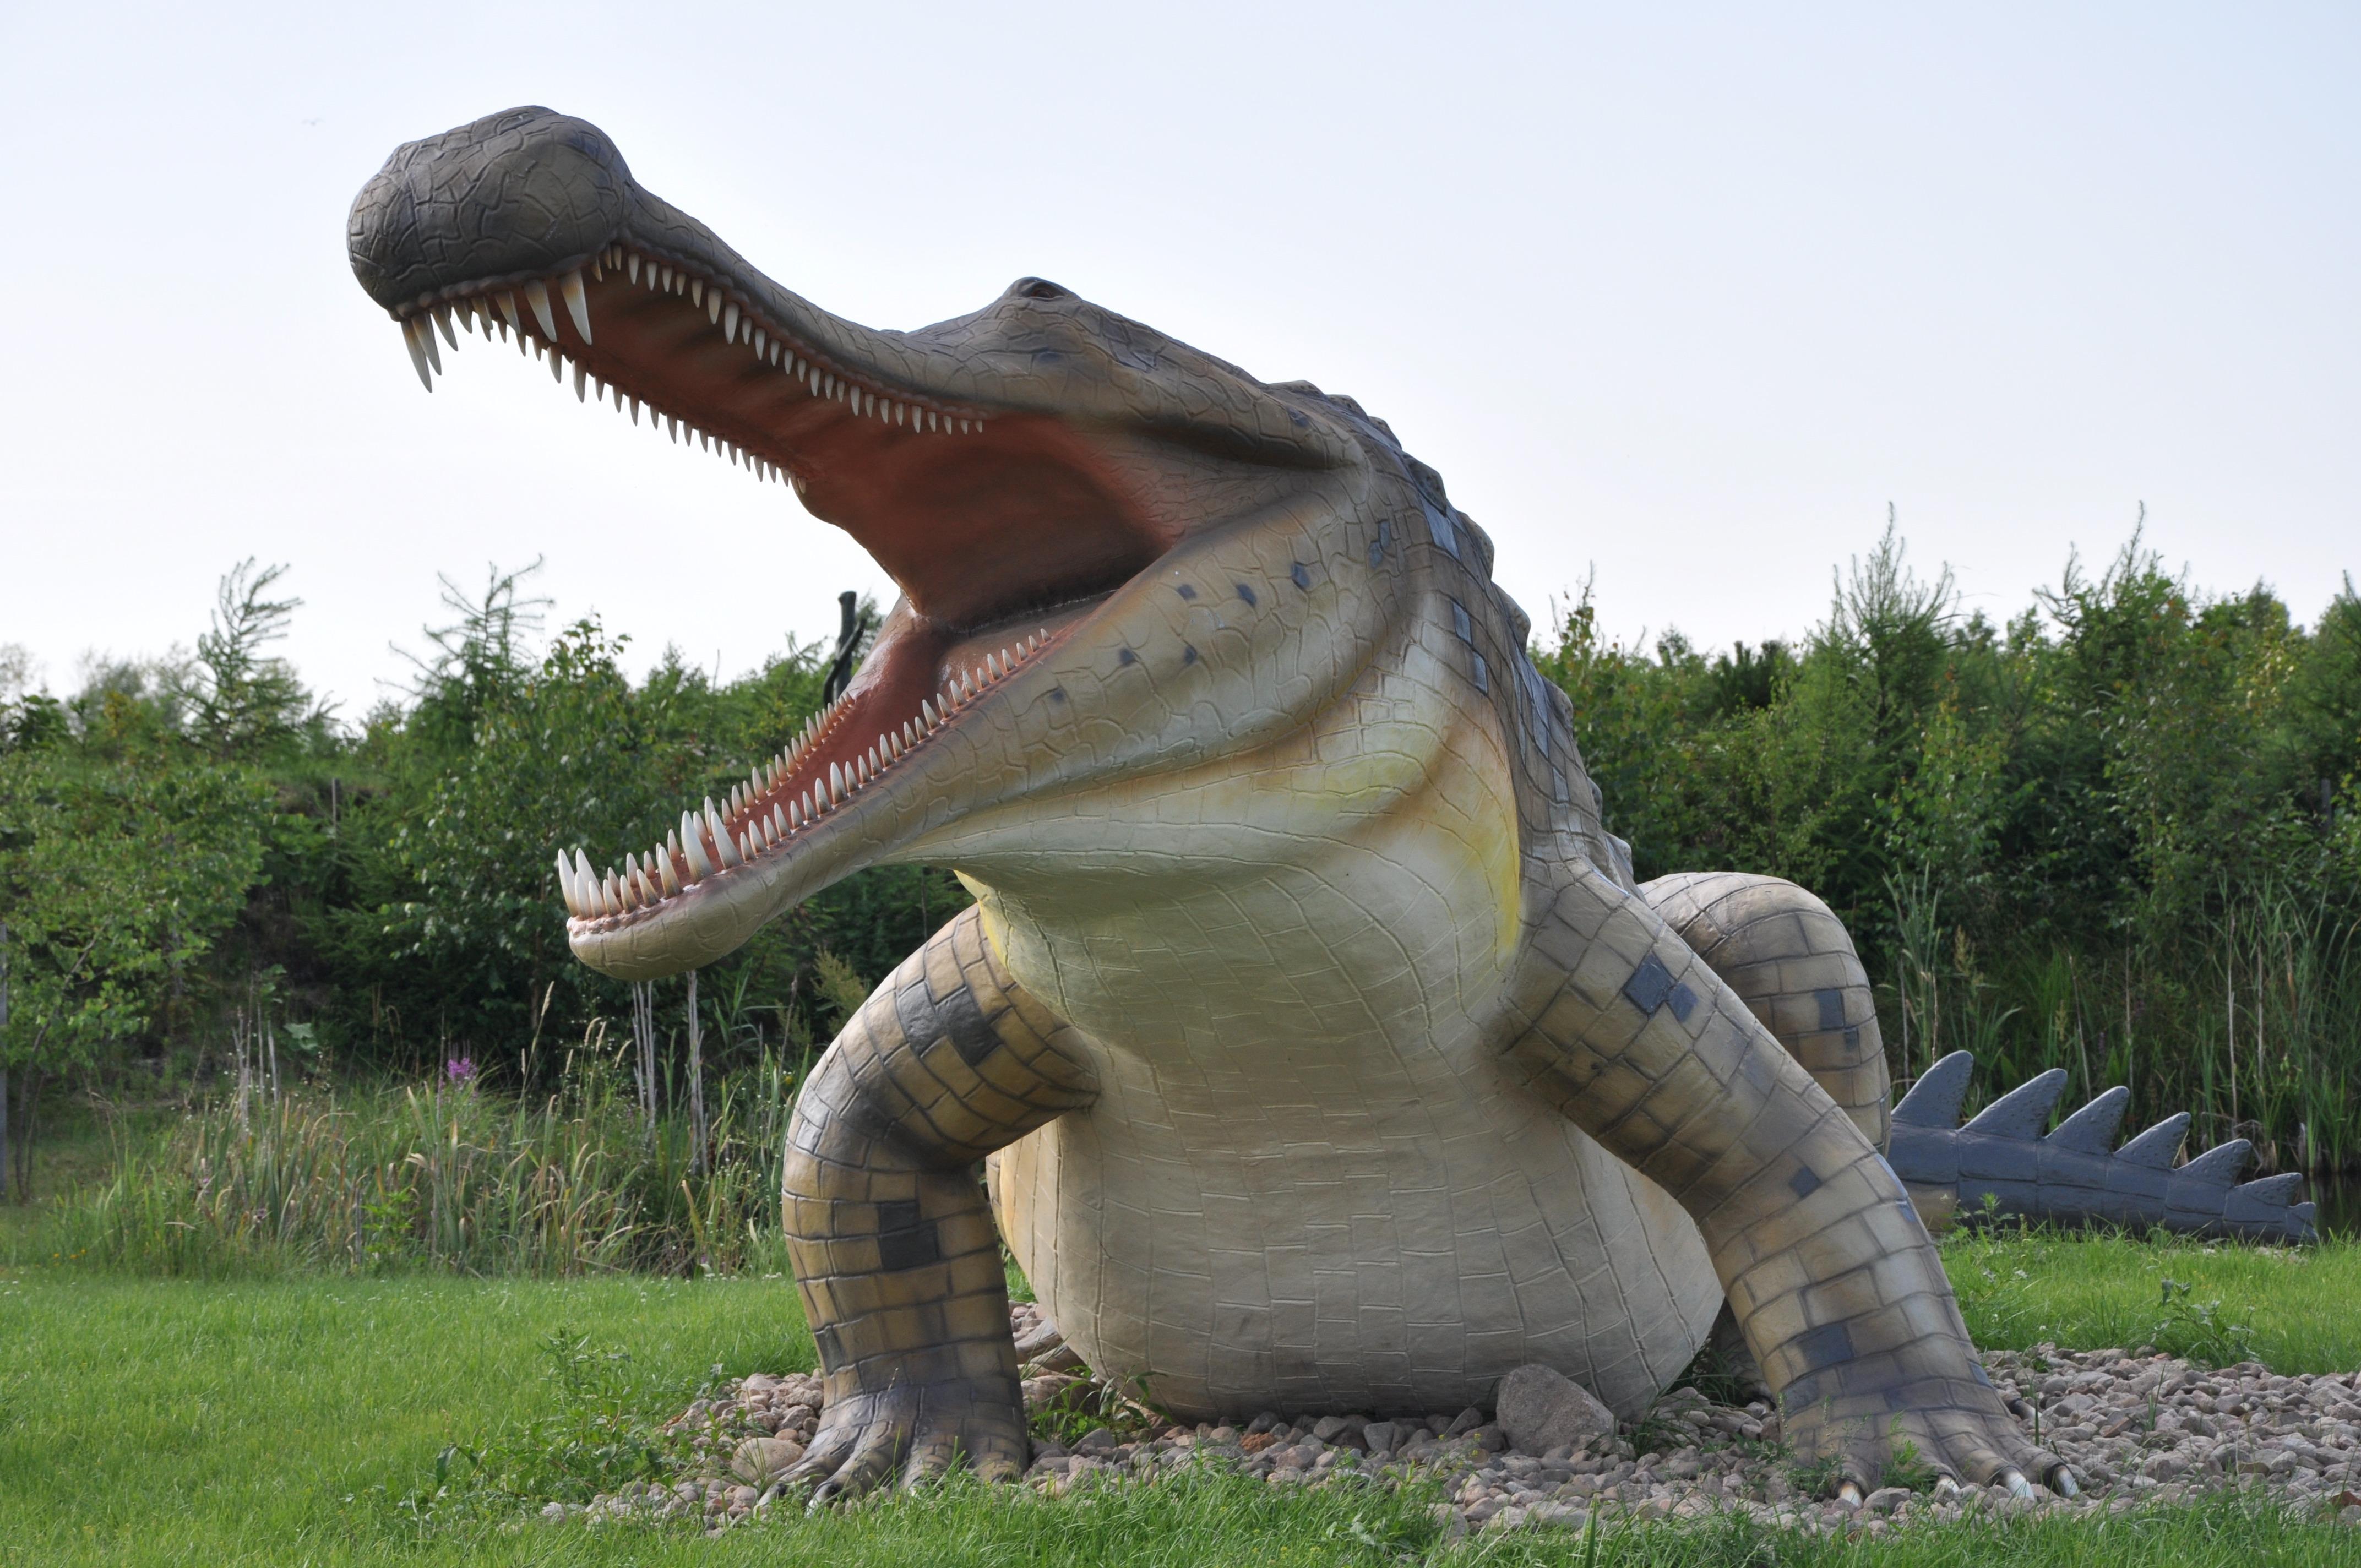 Images gratuites animal faune alligator dinosaure tyrannosaure parc jurassique - Dinosaure de jurassic park ...